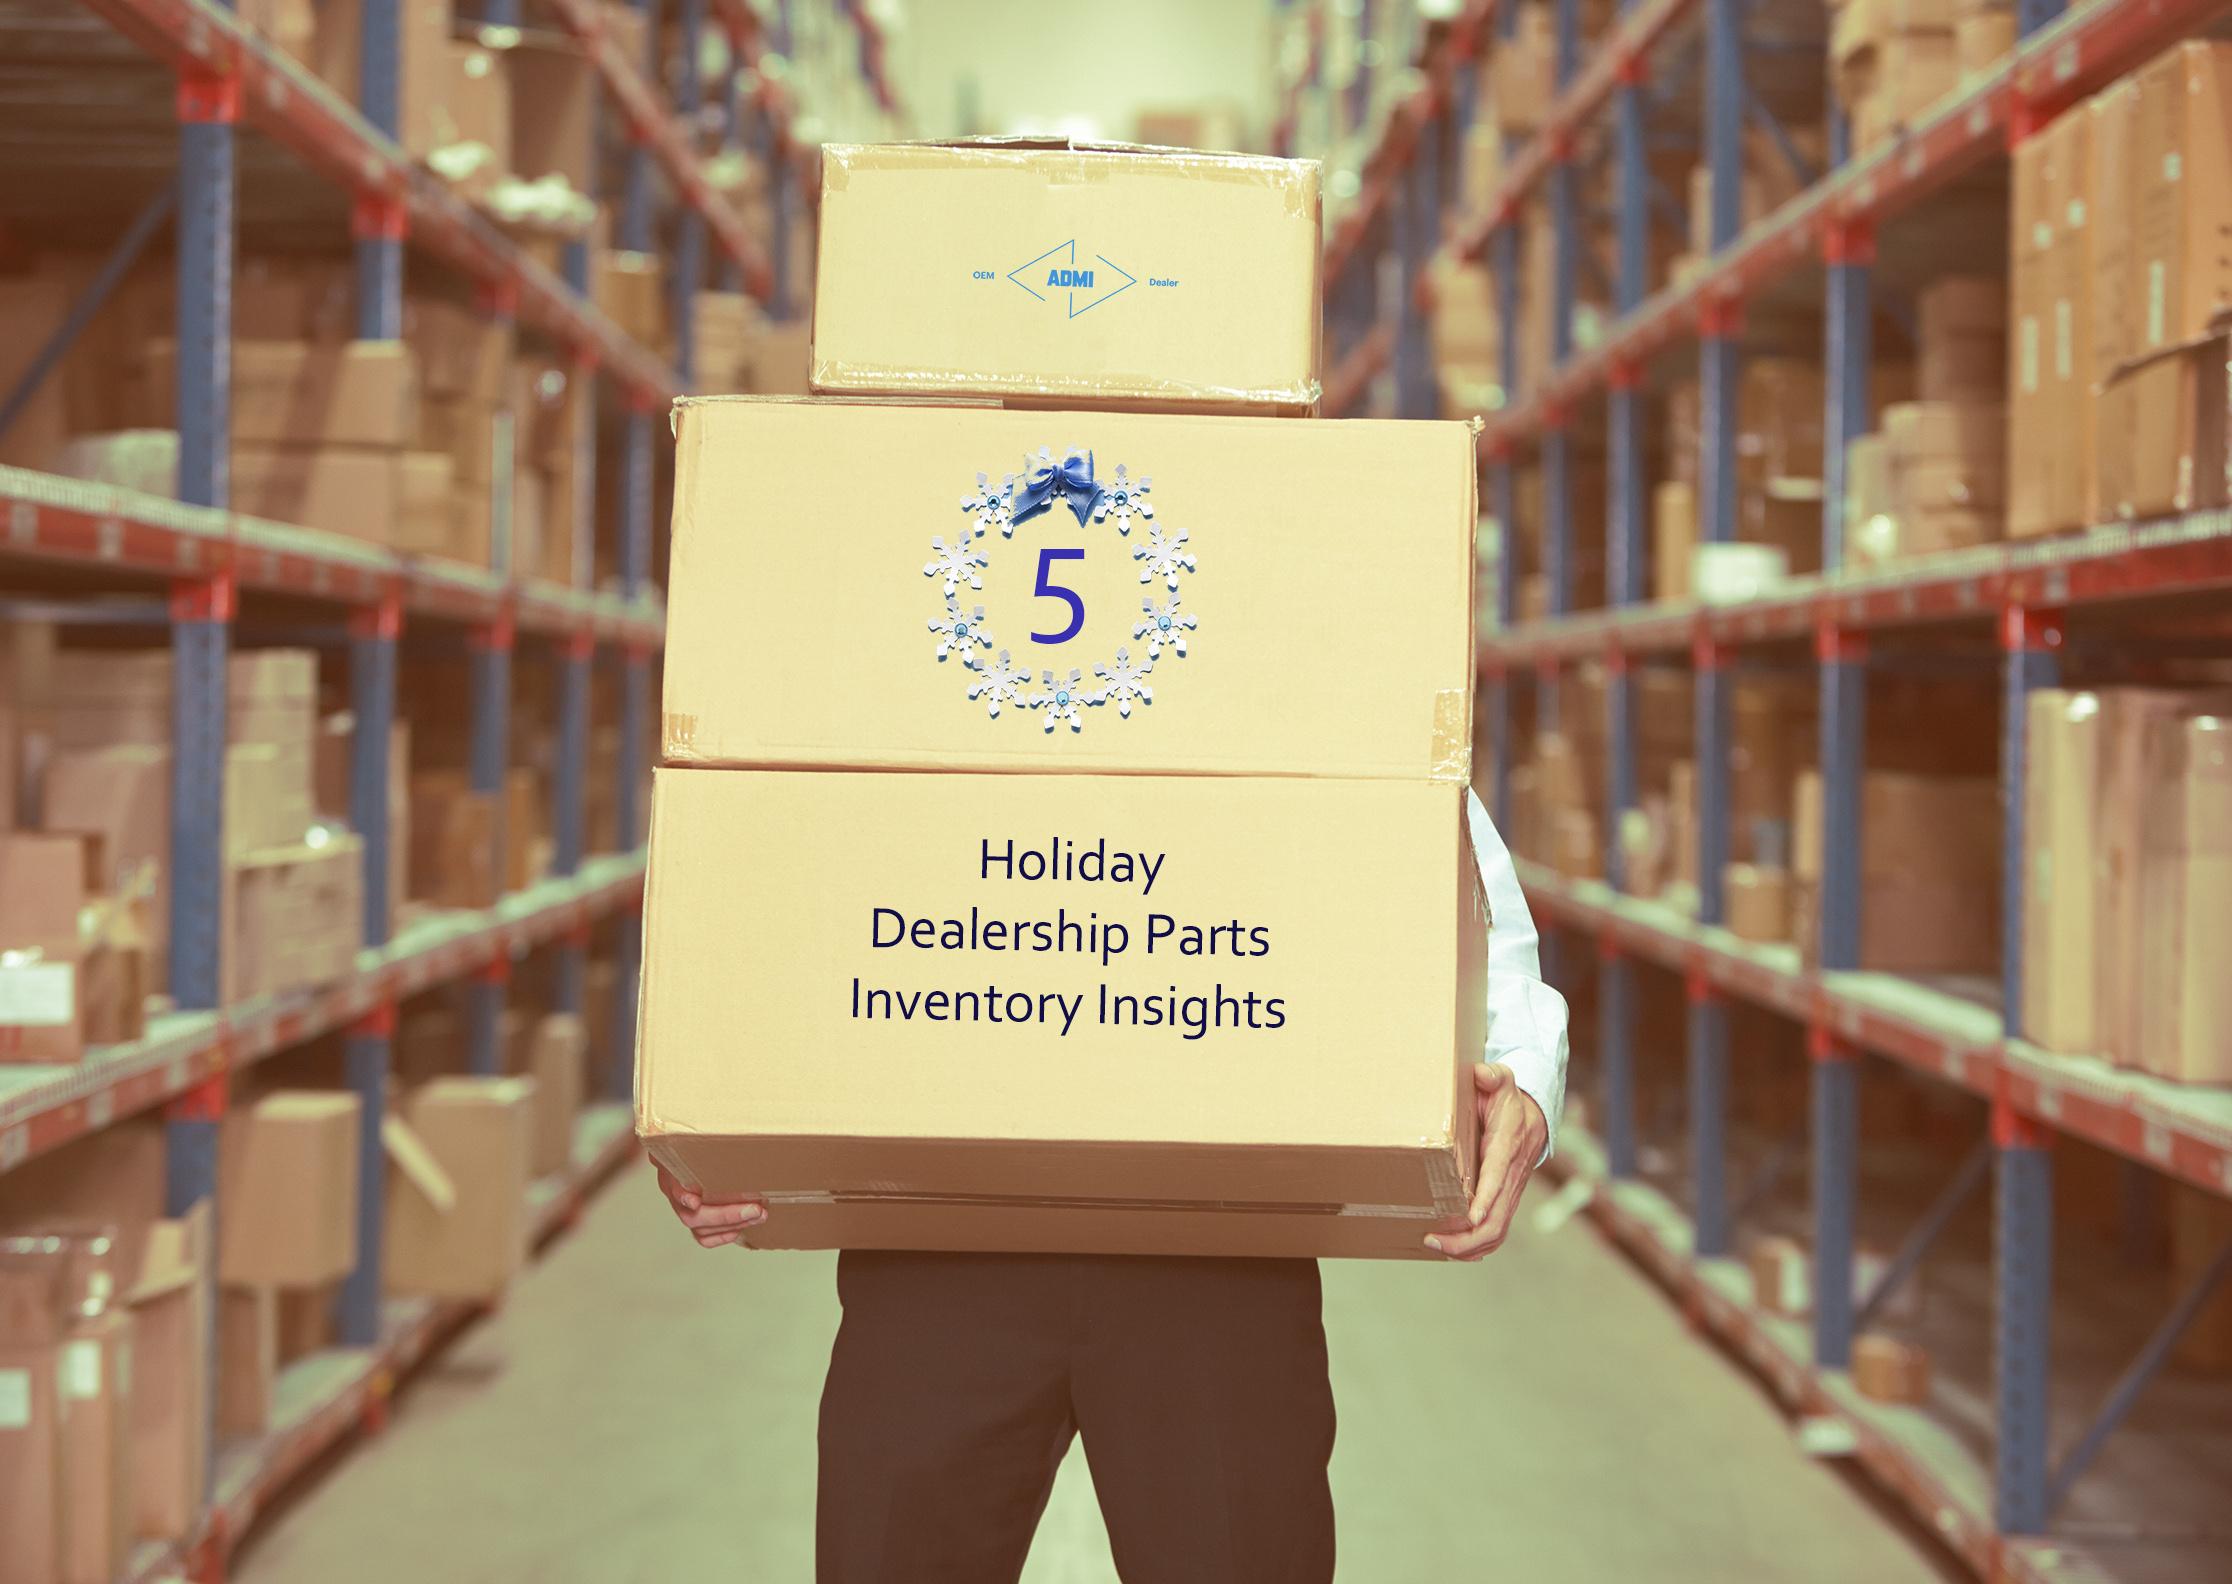 ADMI's5HolidayDealership Parts InventoryInsights